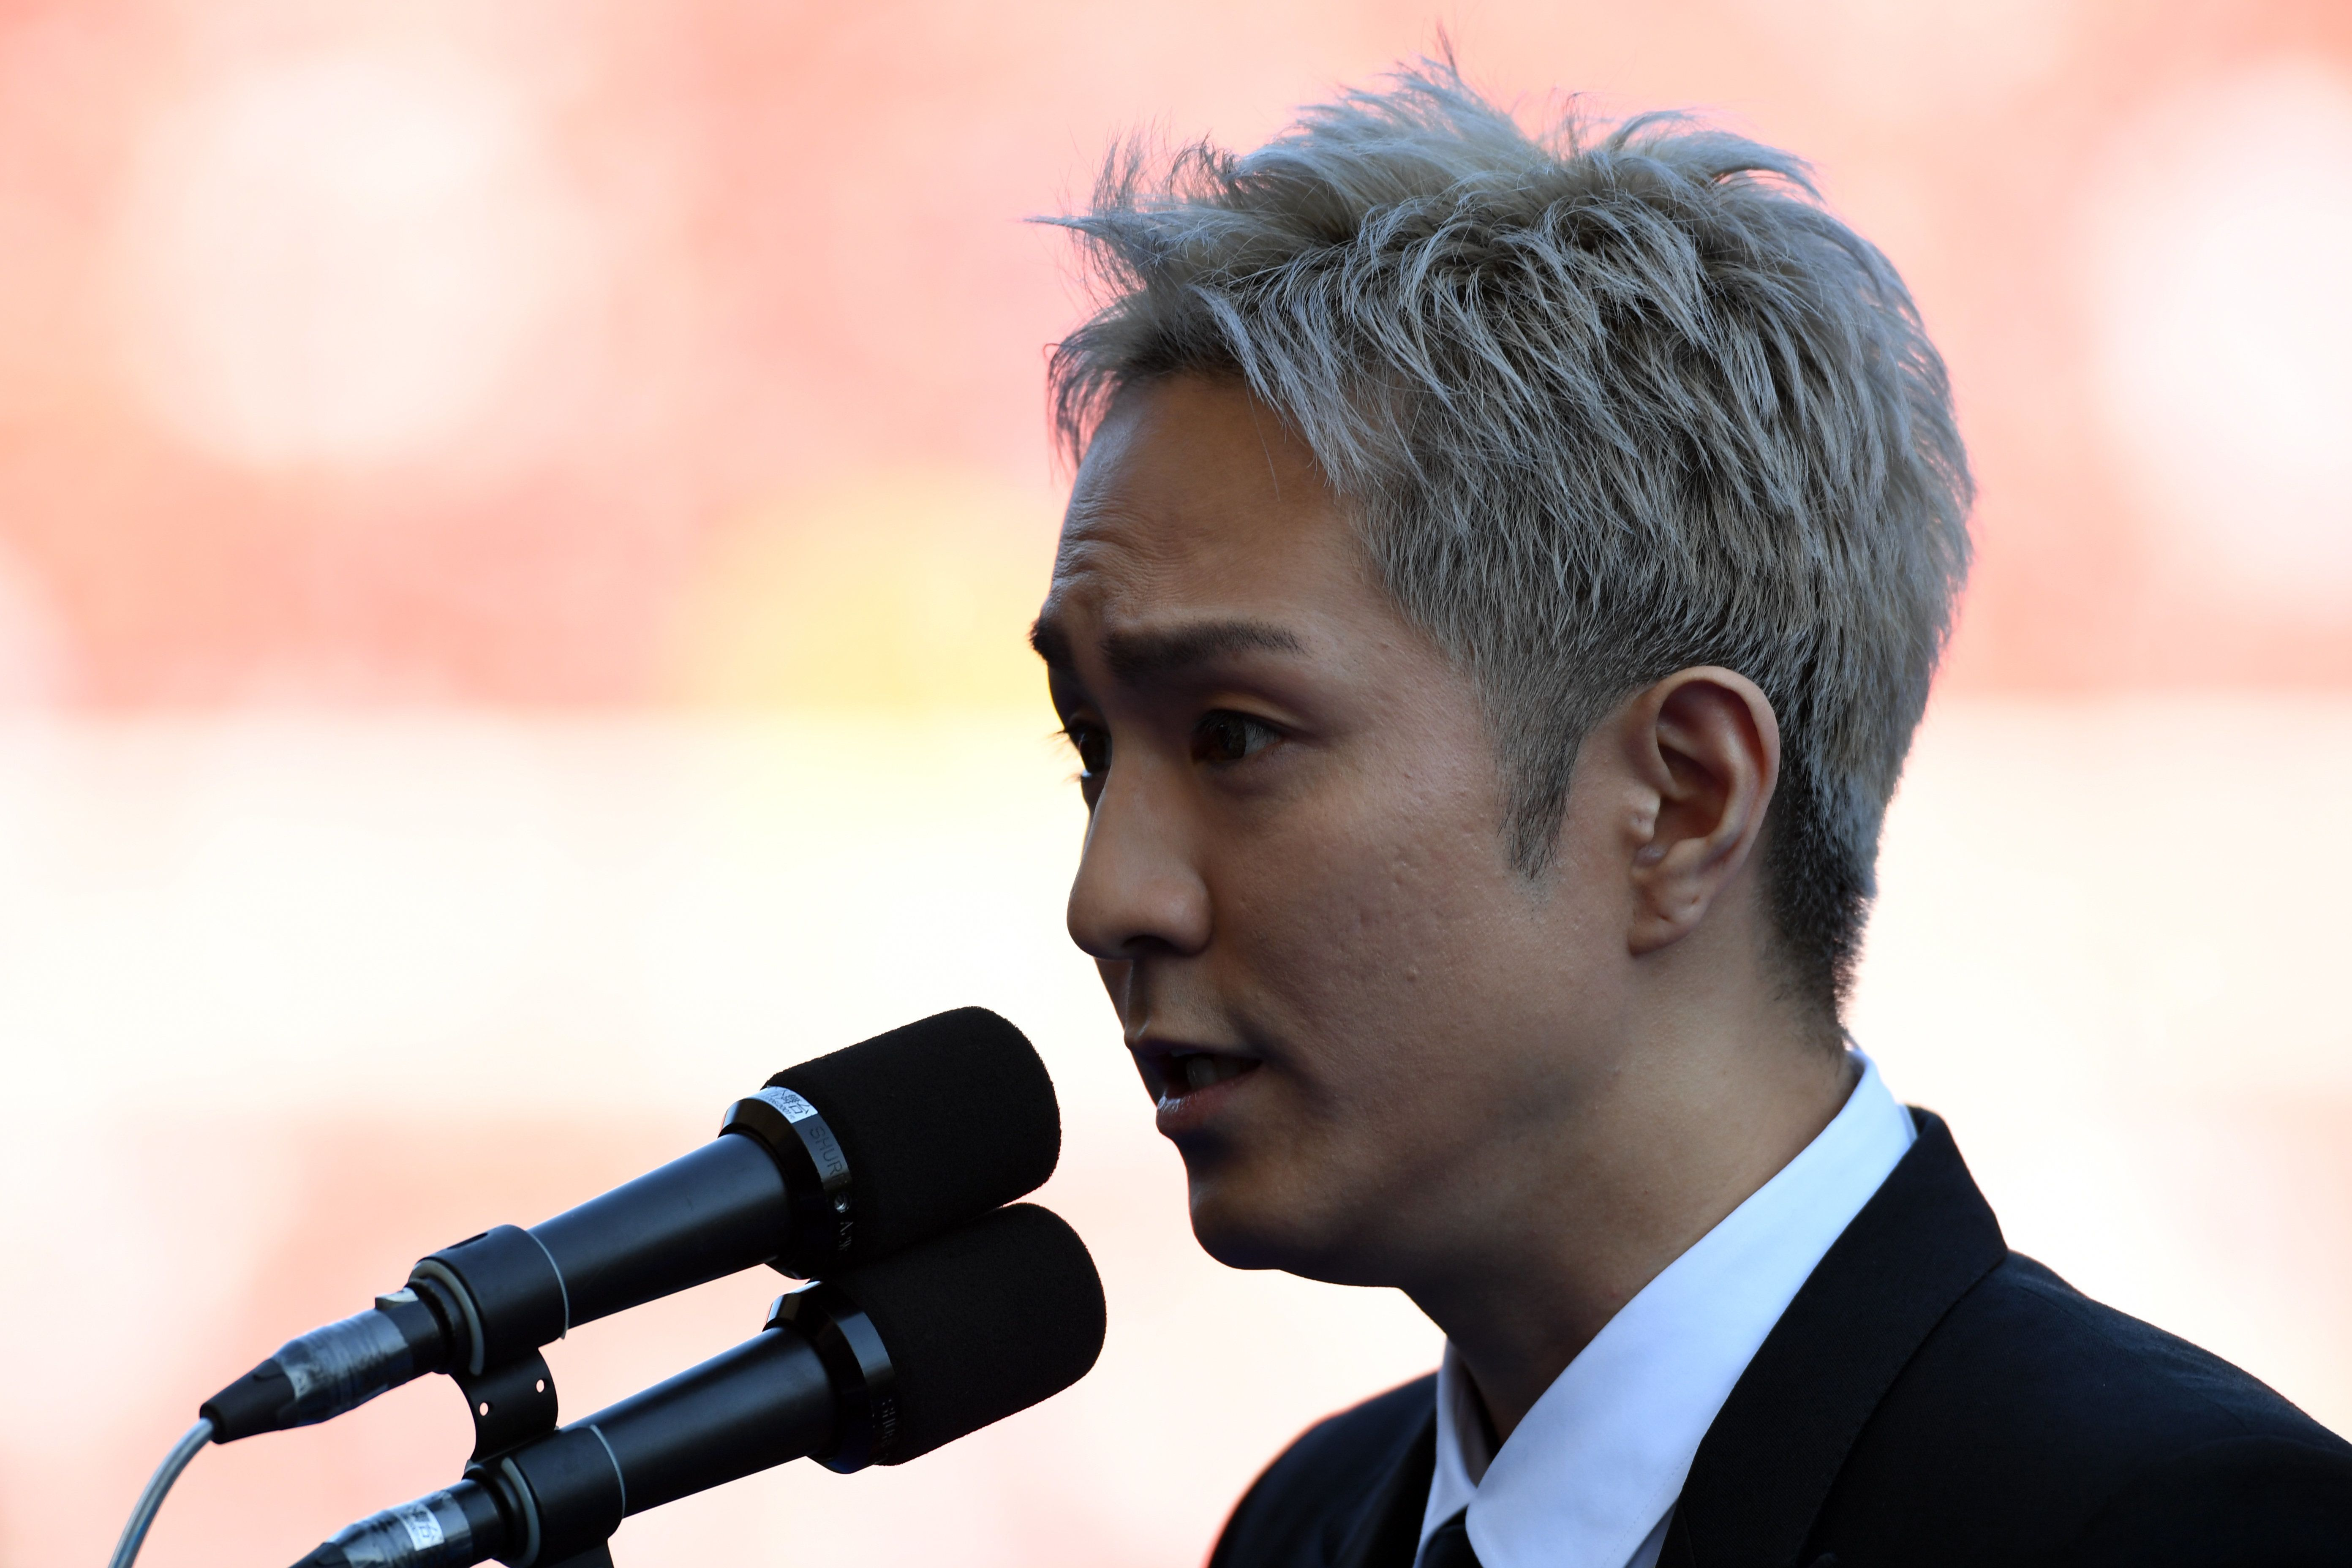 AAA浦田直也を逮捕、ラフォーレ原宿の展覧会は中止に 公式サイトで謝罪